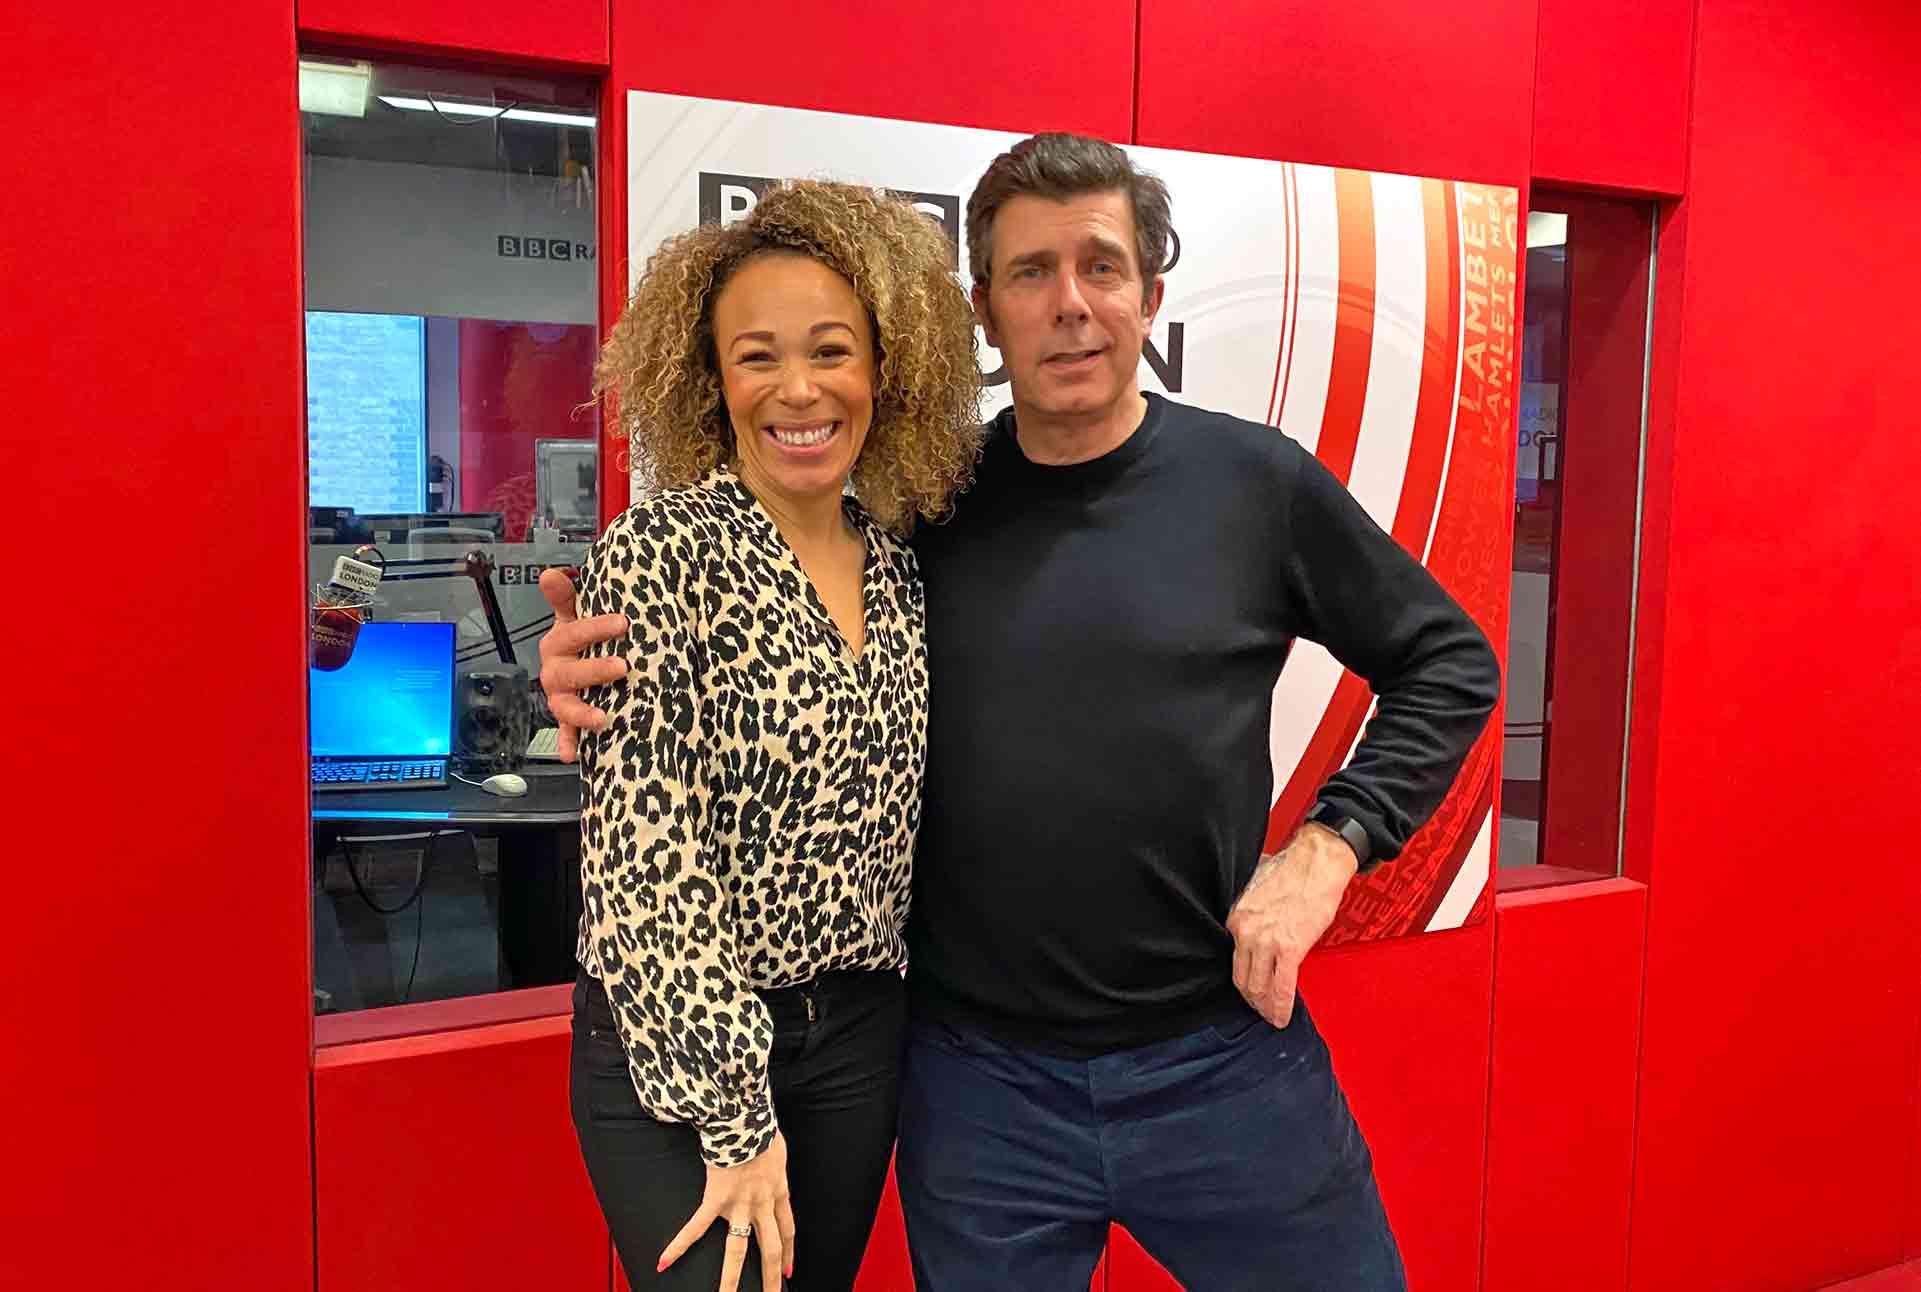 Max Kirsten On BBC Radio London Talking About Sleep - 23rd February 2020